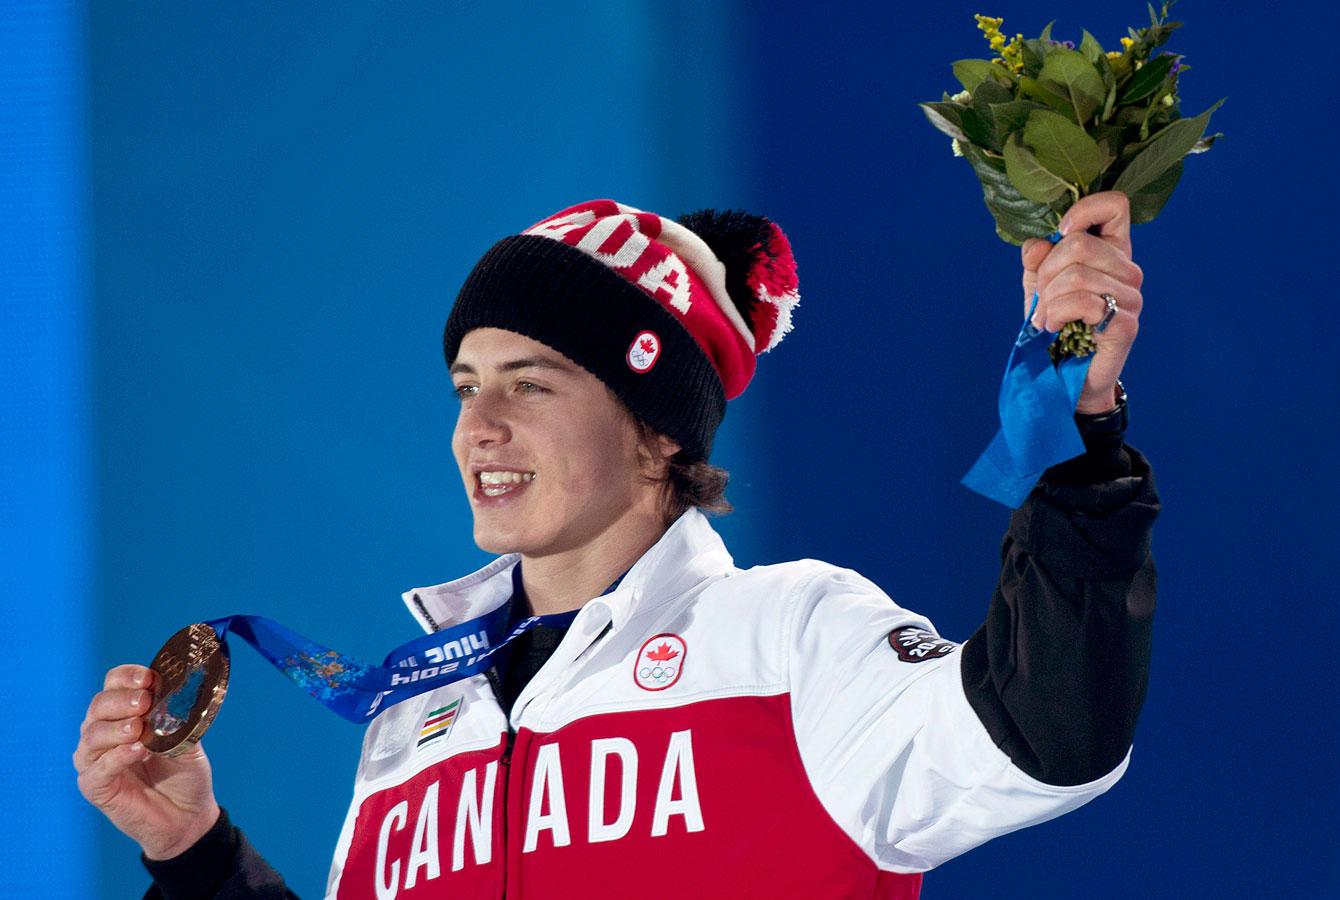 Sochi 2014 bronze medal-winning snowboarder Mark McMorris is a Canada Games alumn.